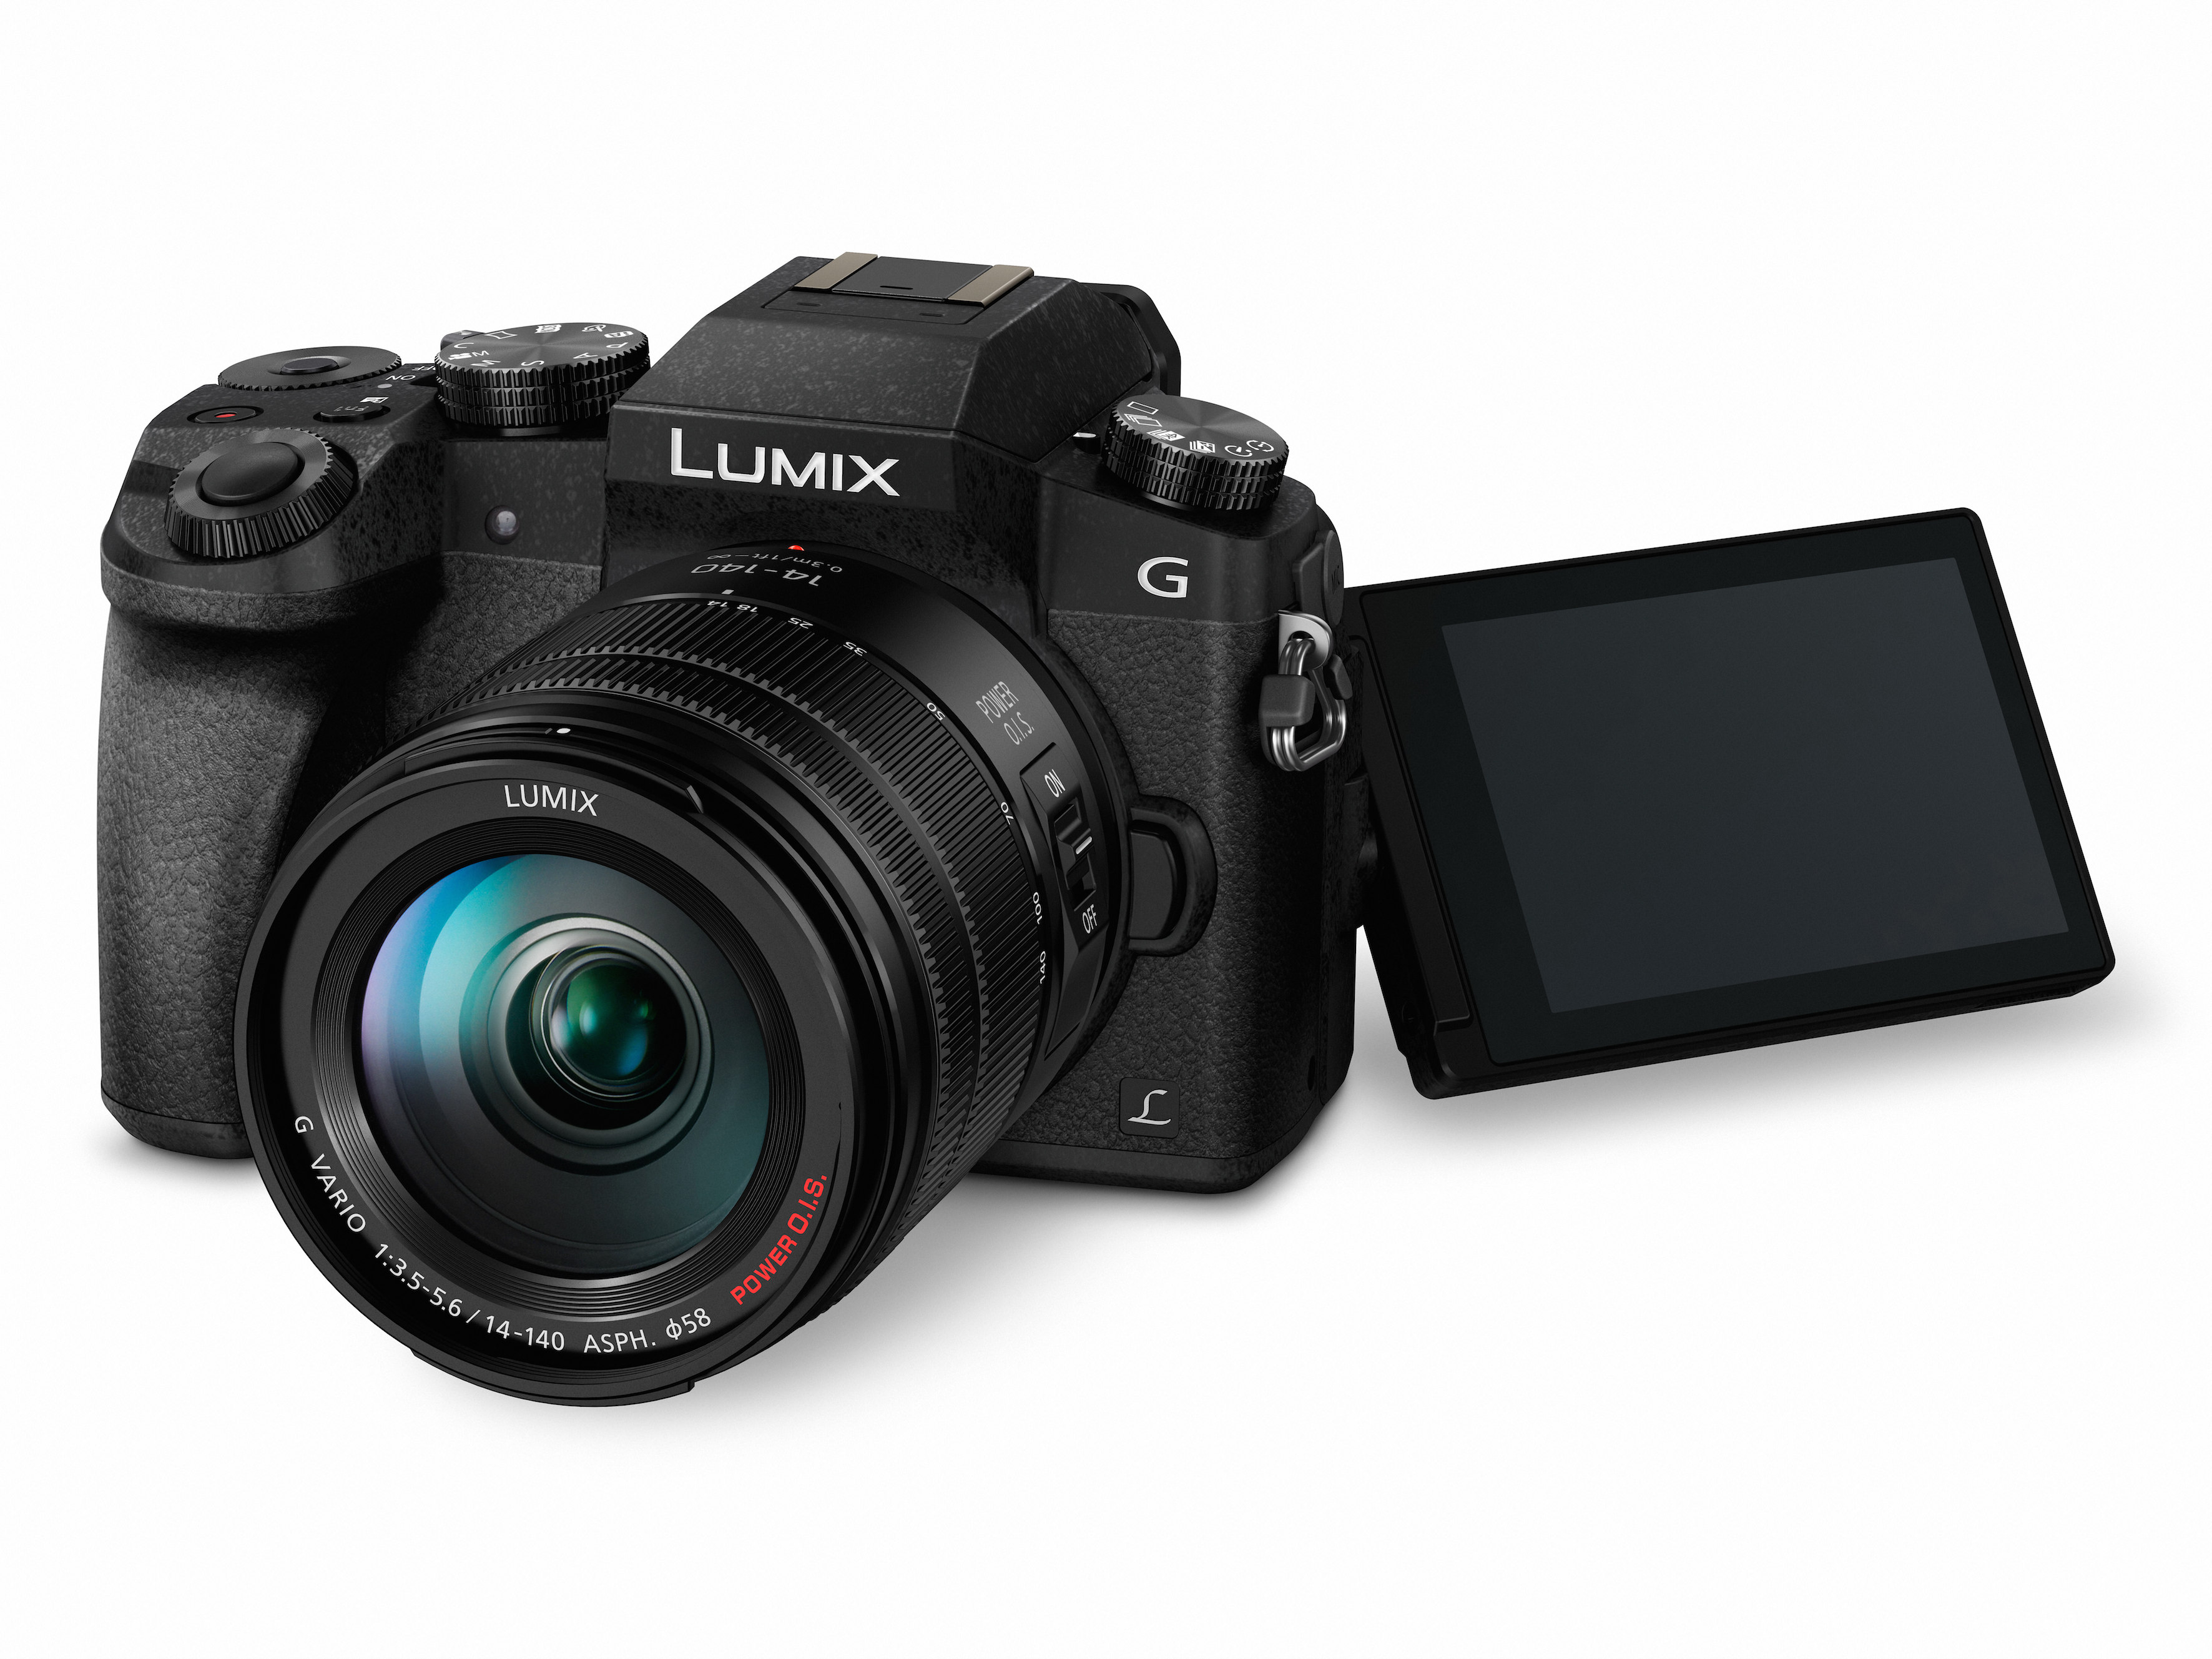 Panasonic: Lumix G70 macht 30 Fotos mit 8 Megapixeln pro Sekunde - Panasonic Lumix DMC-G70 (Bild: Panasonic)